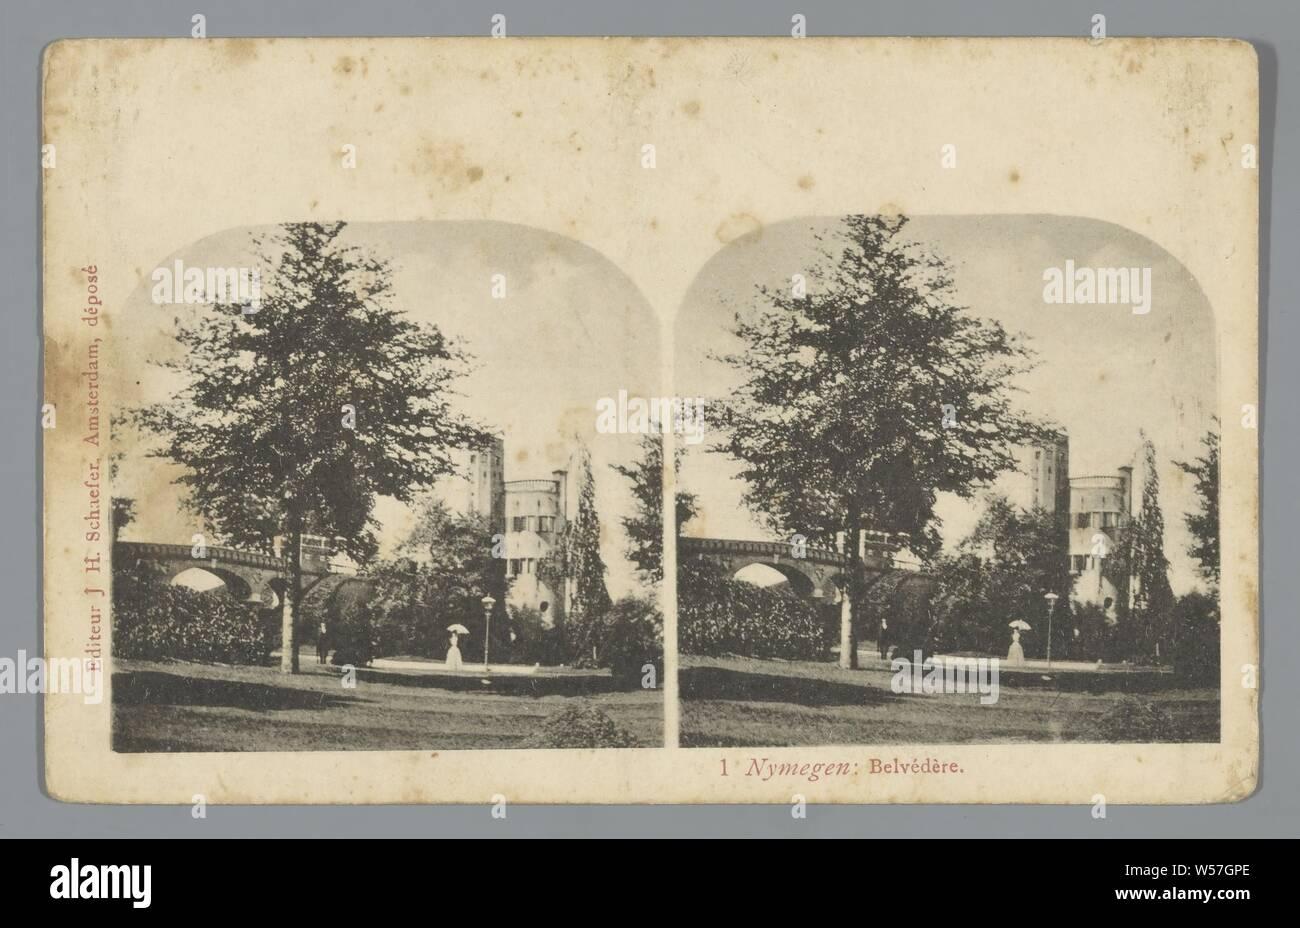 Nymegen. Belvedere, J.H. Schaefer, 1900 - 1940 Stock Photo